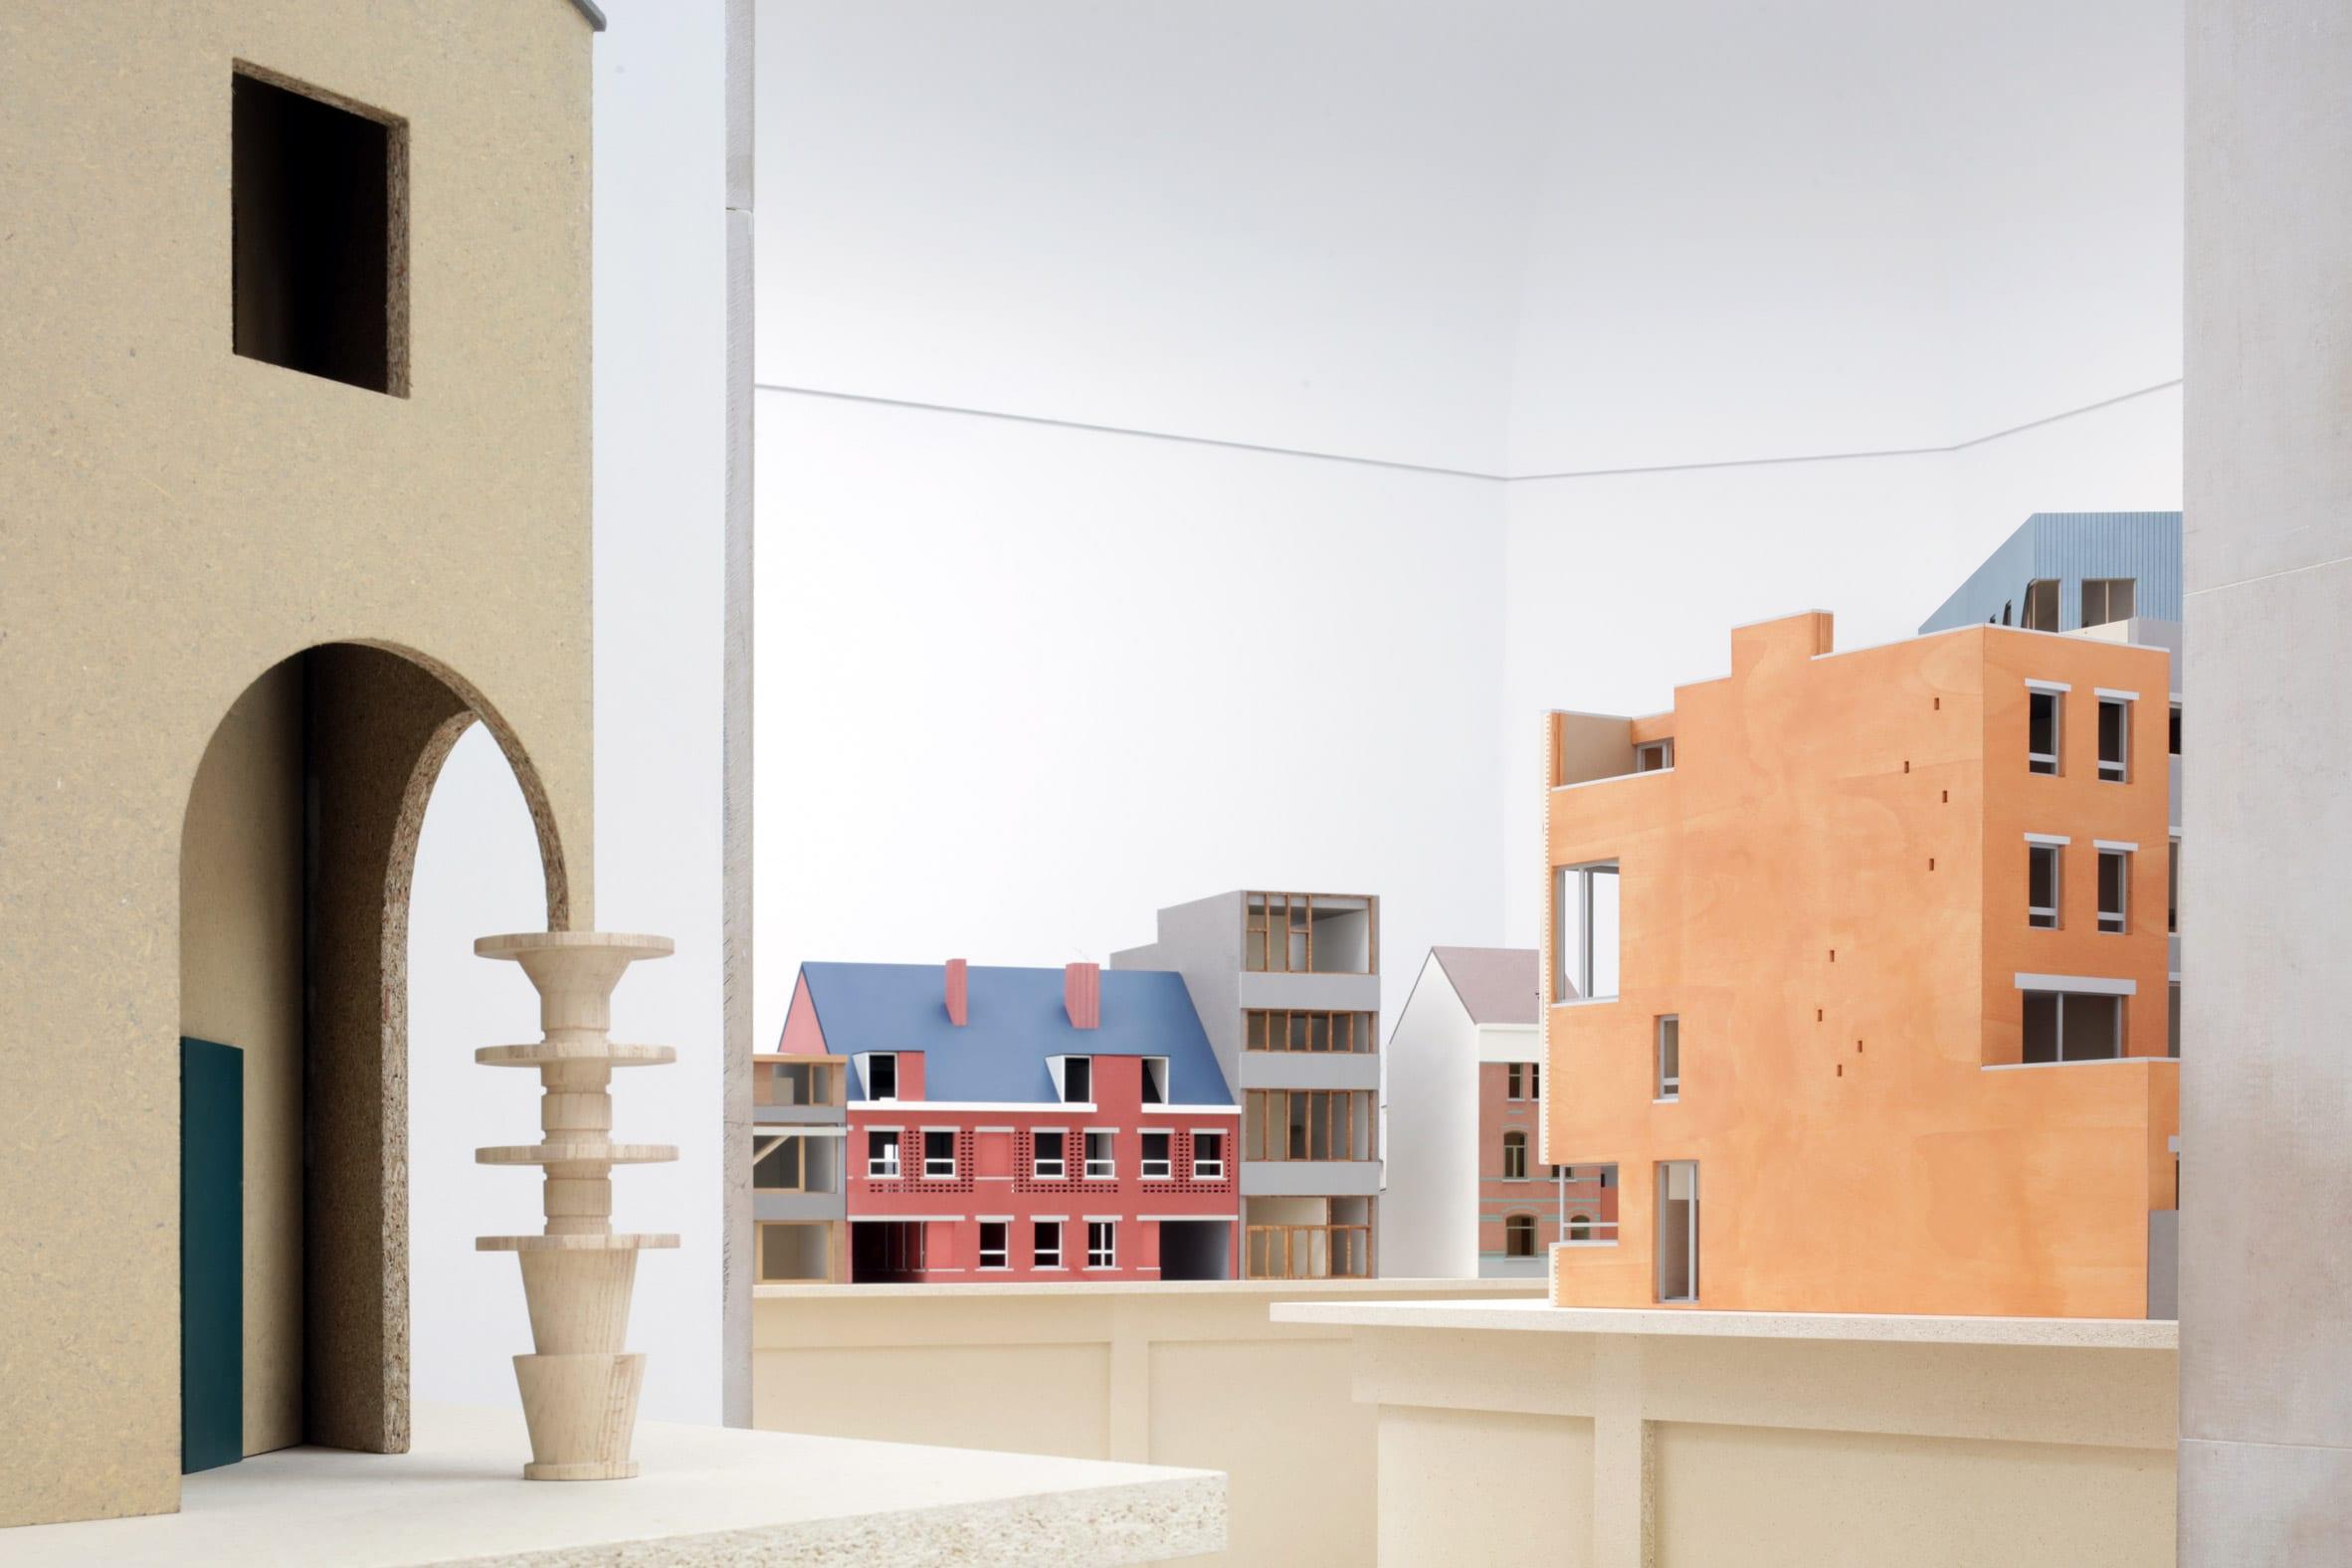 Exhibition at Venice Architecture Biennale